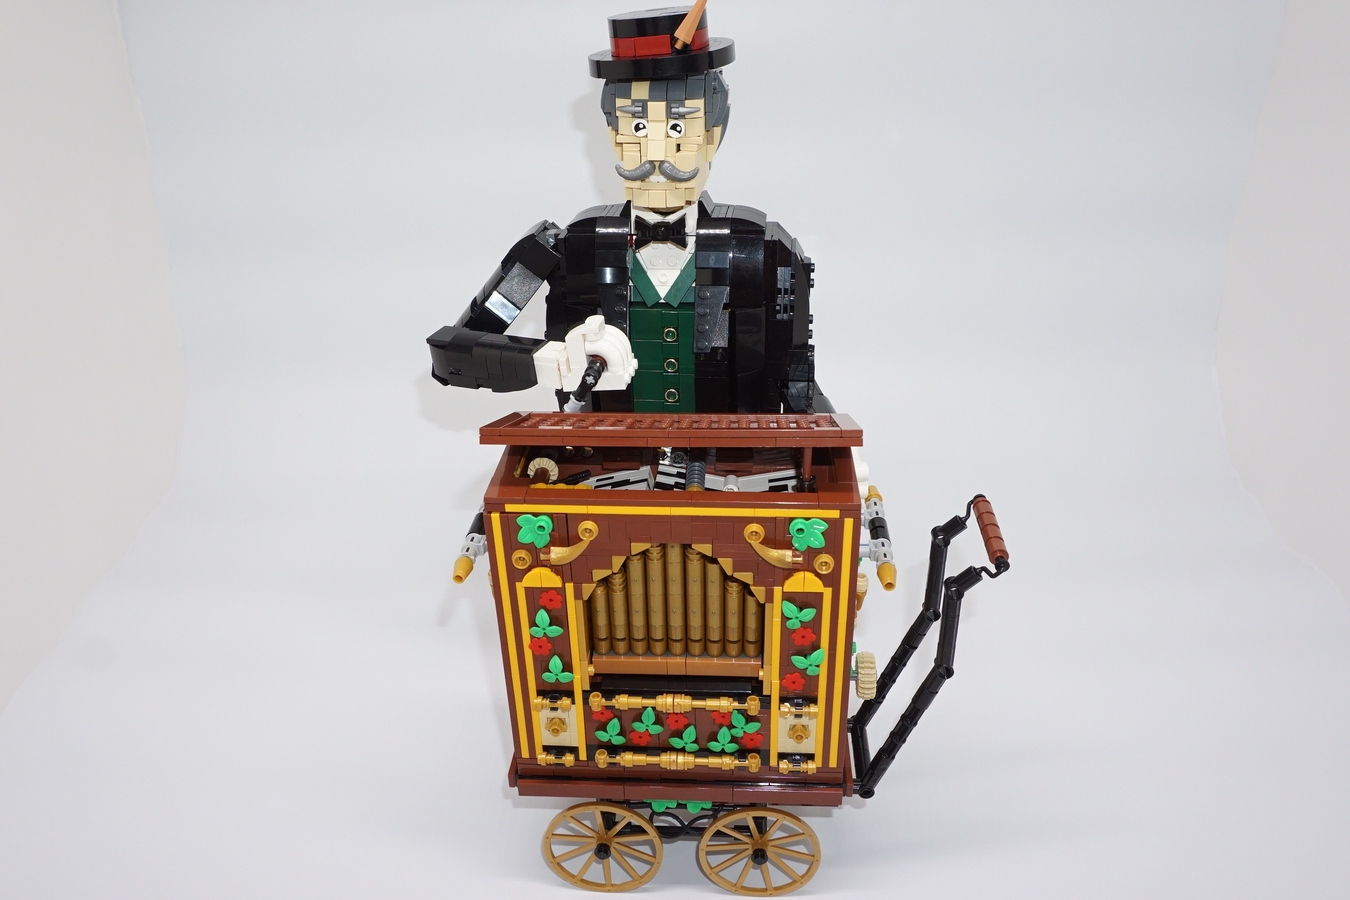 lego-ideas-the-last-organ-grinder-roldan-ag zusammengebaut.com